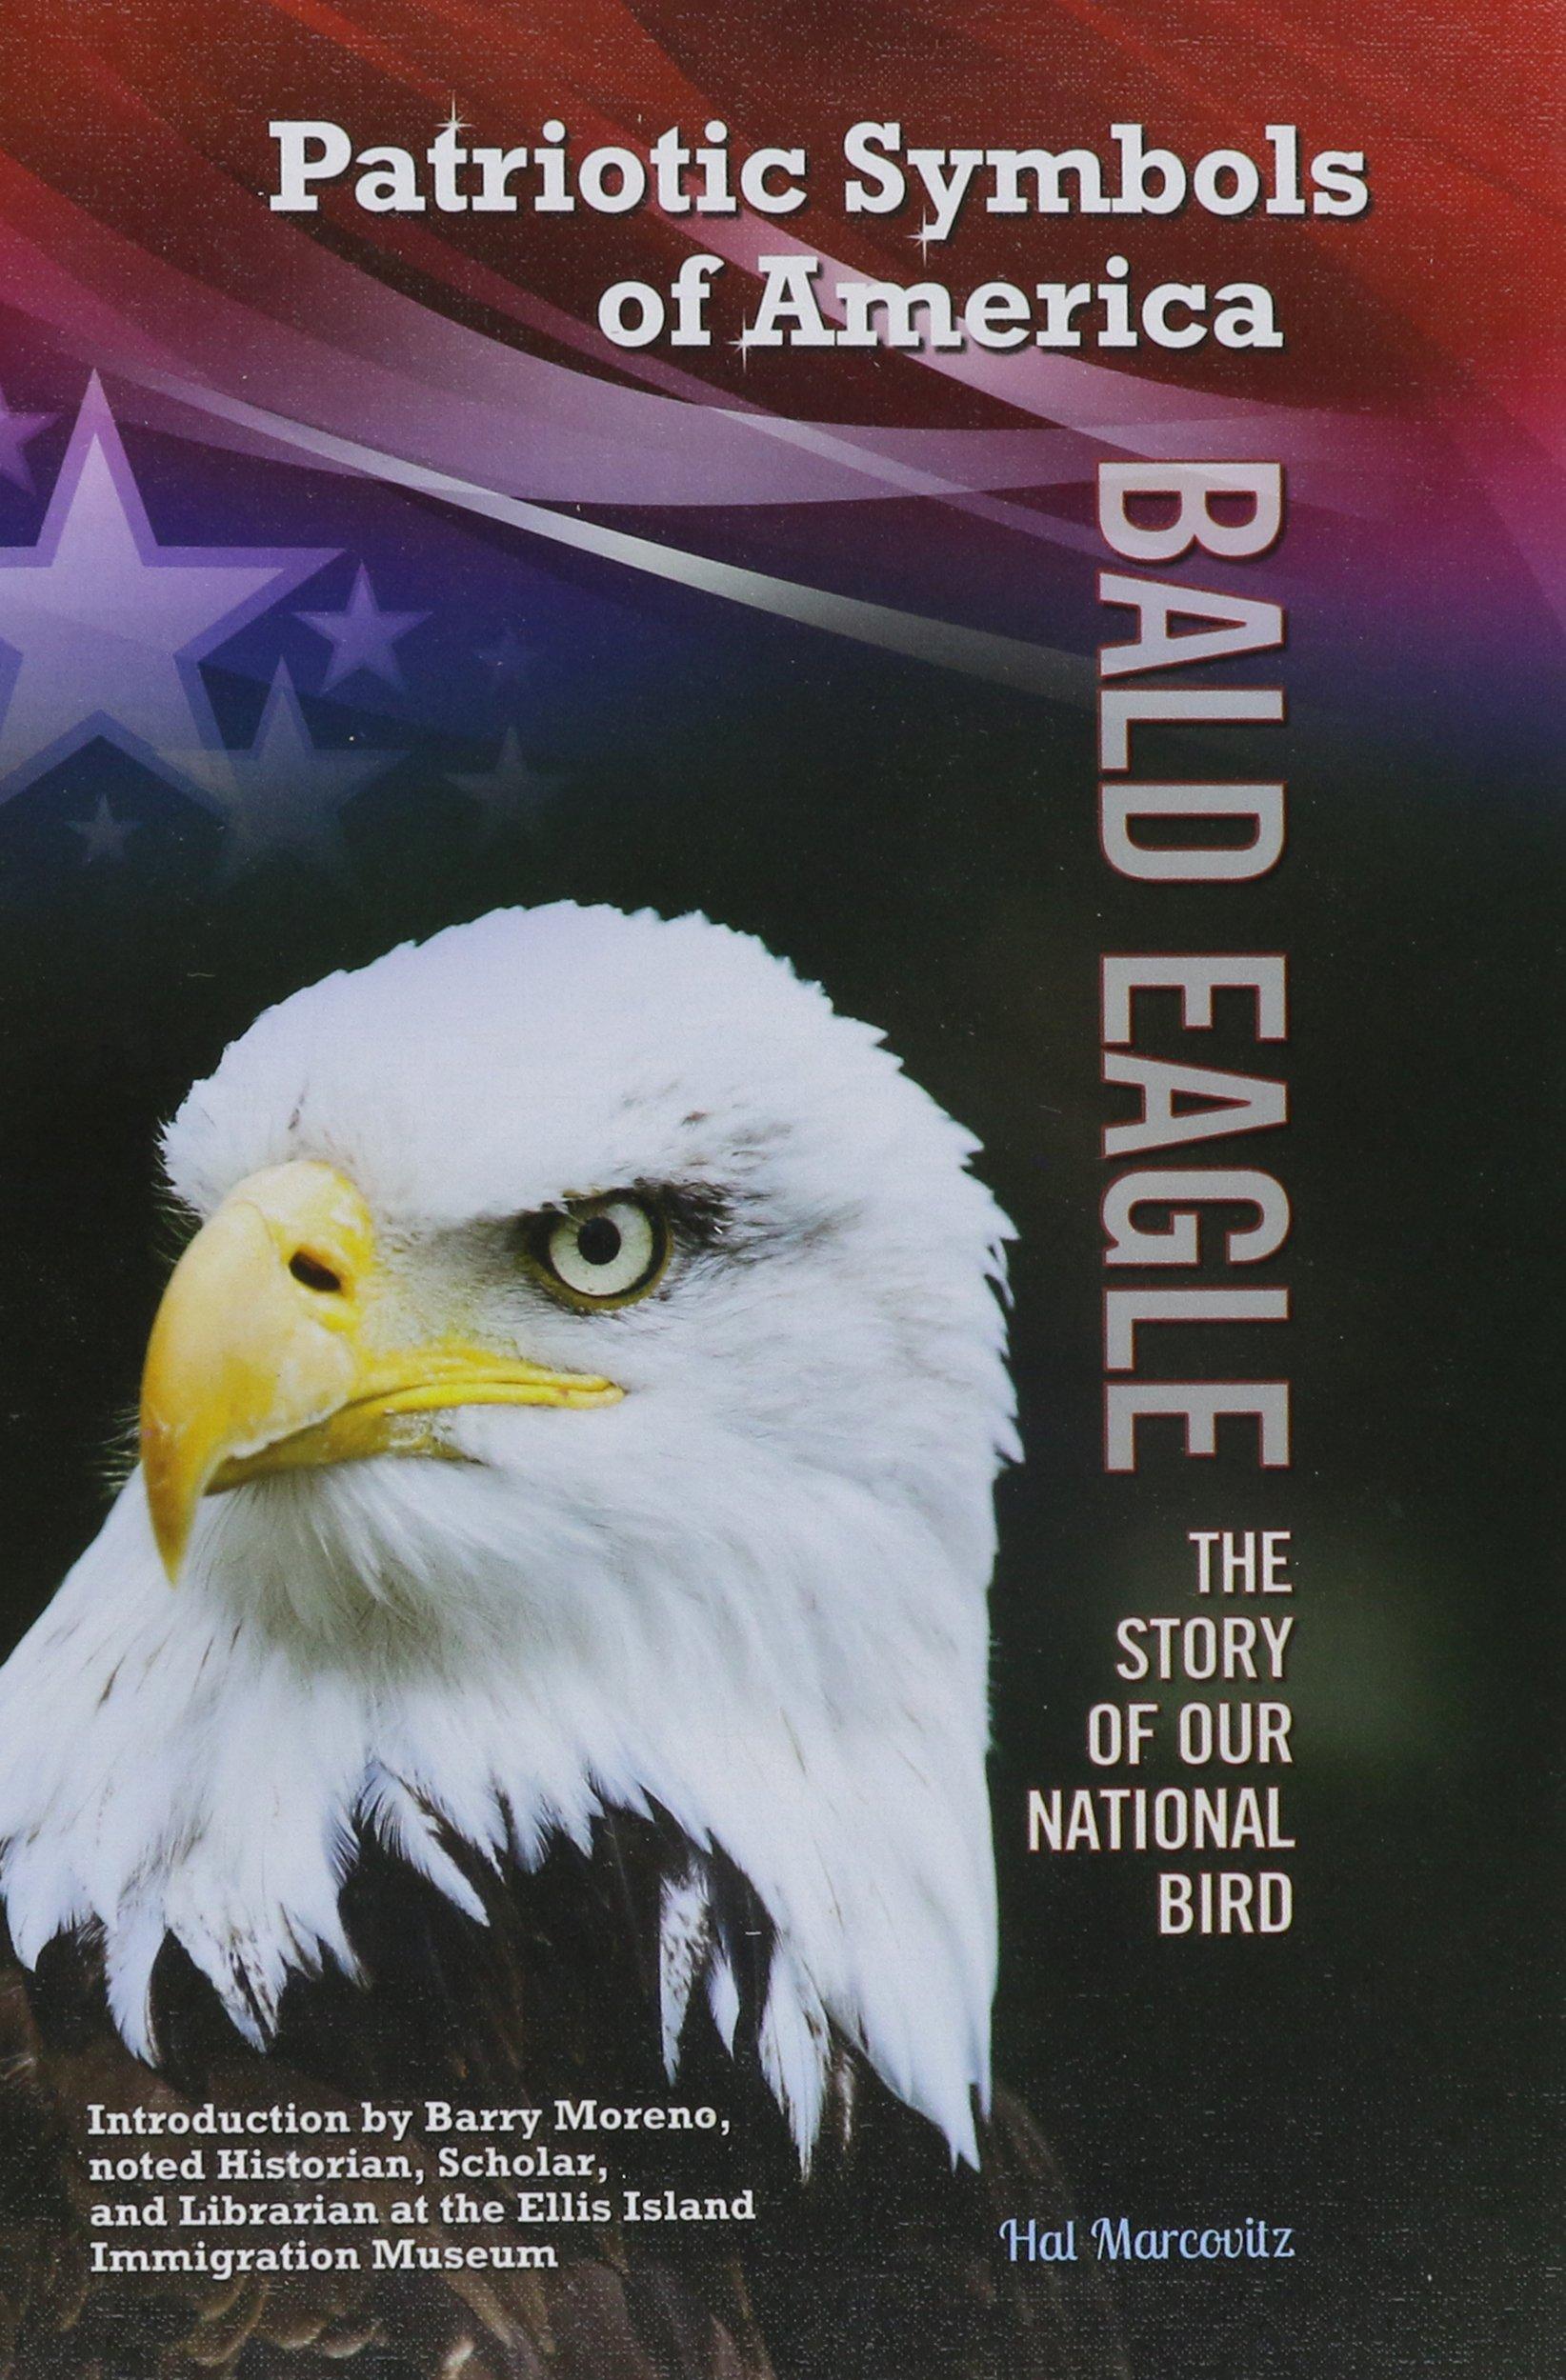 Bald eagle the story of our national bird patriotic symbols of bald eagle the story of our national bird patriotic symbols of america hal marcovitz 9781422231203 amazon books buycottarizona Choice Image